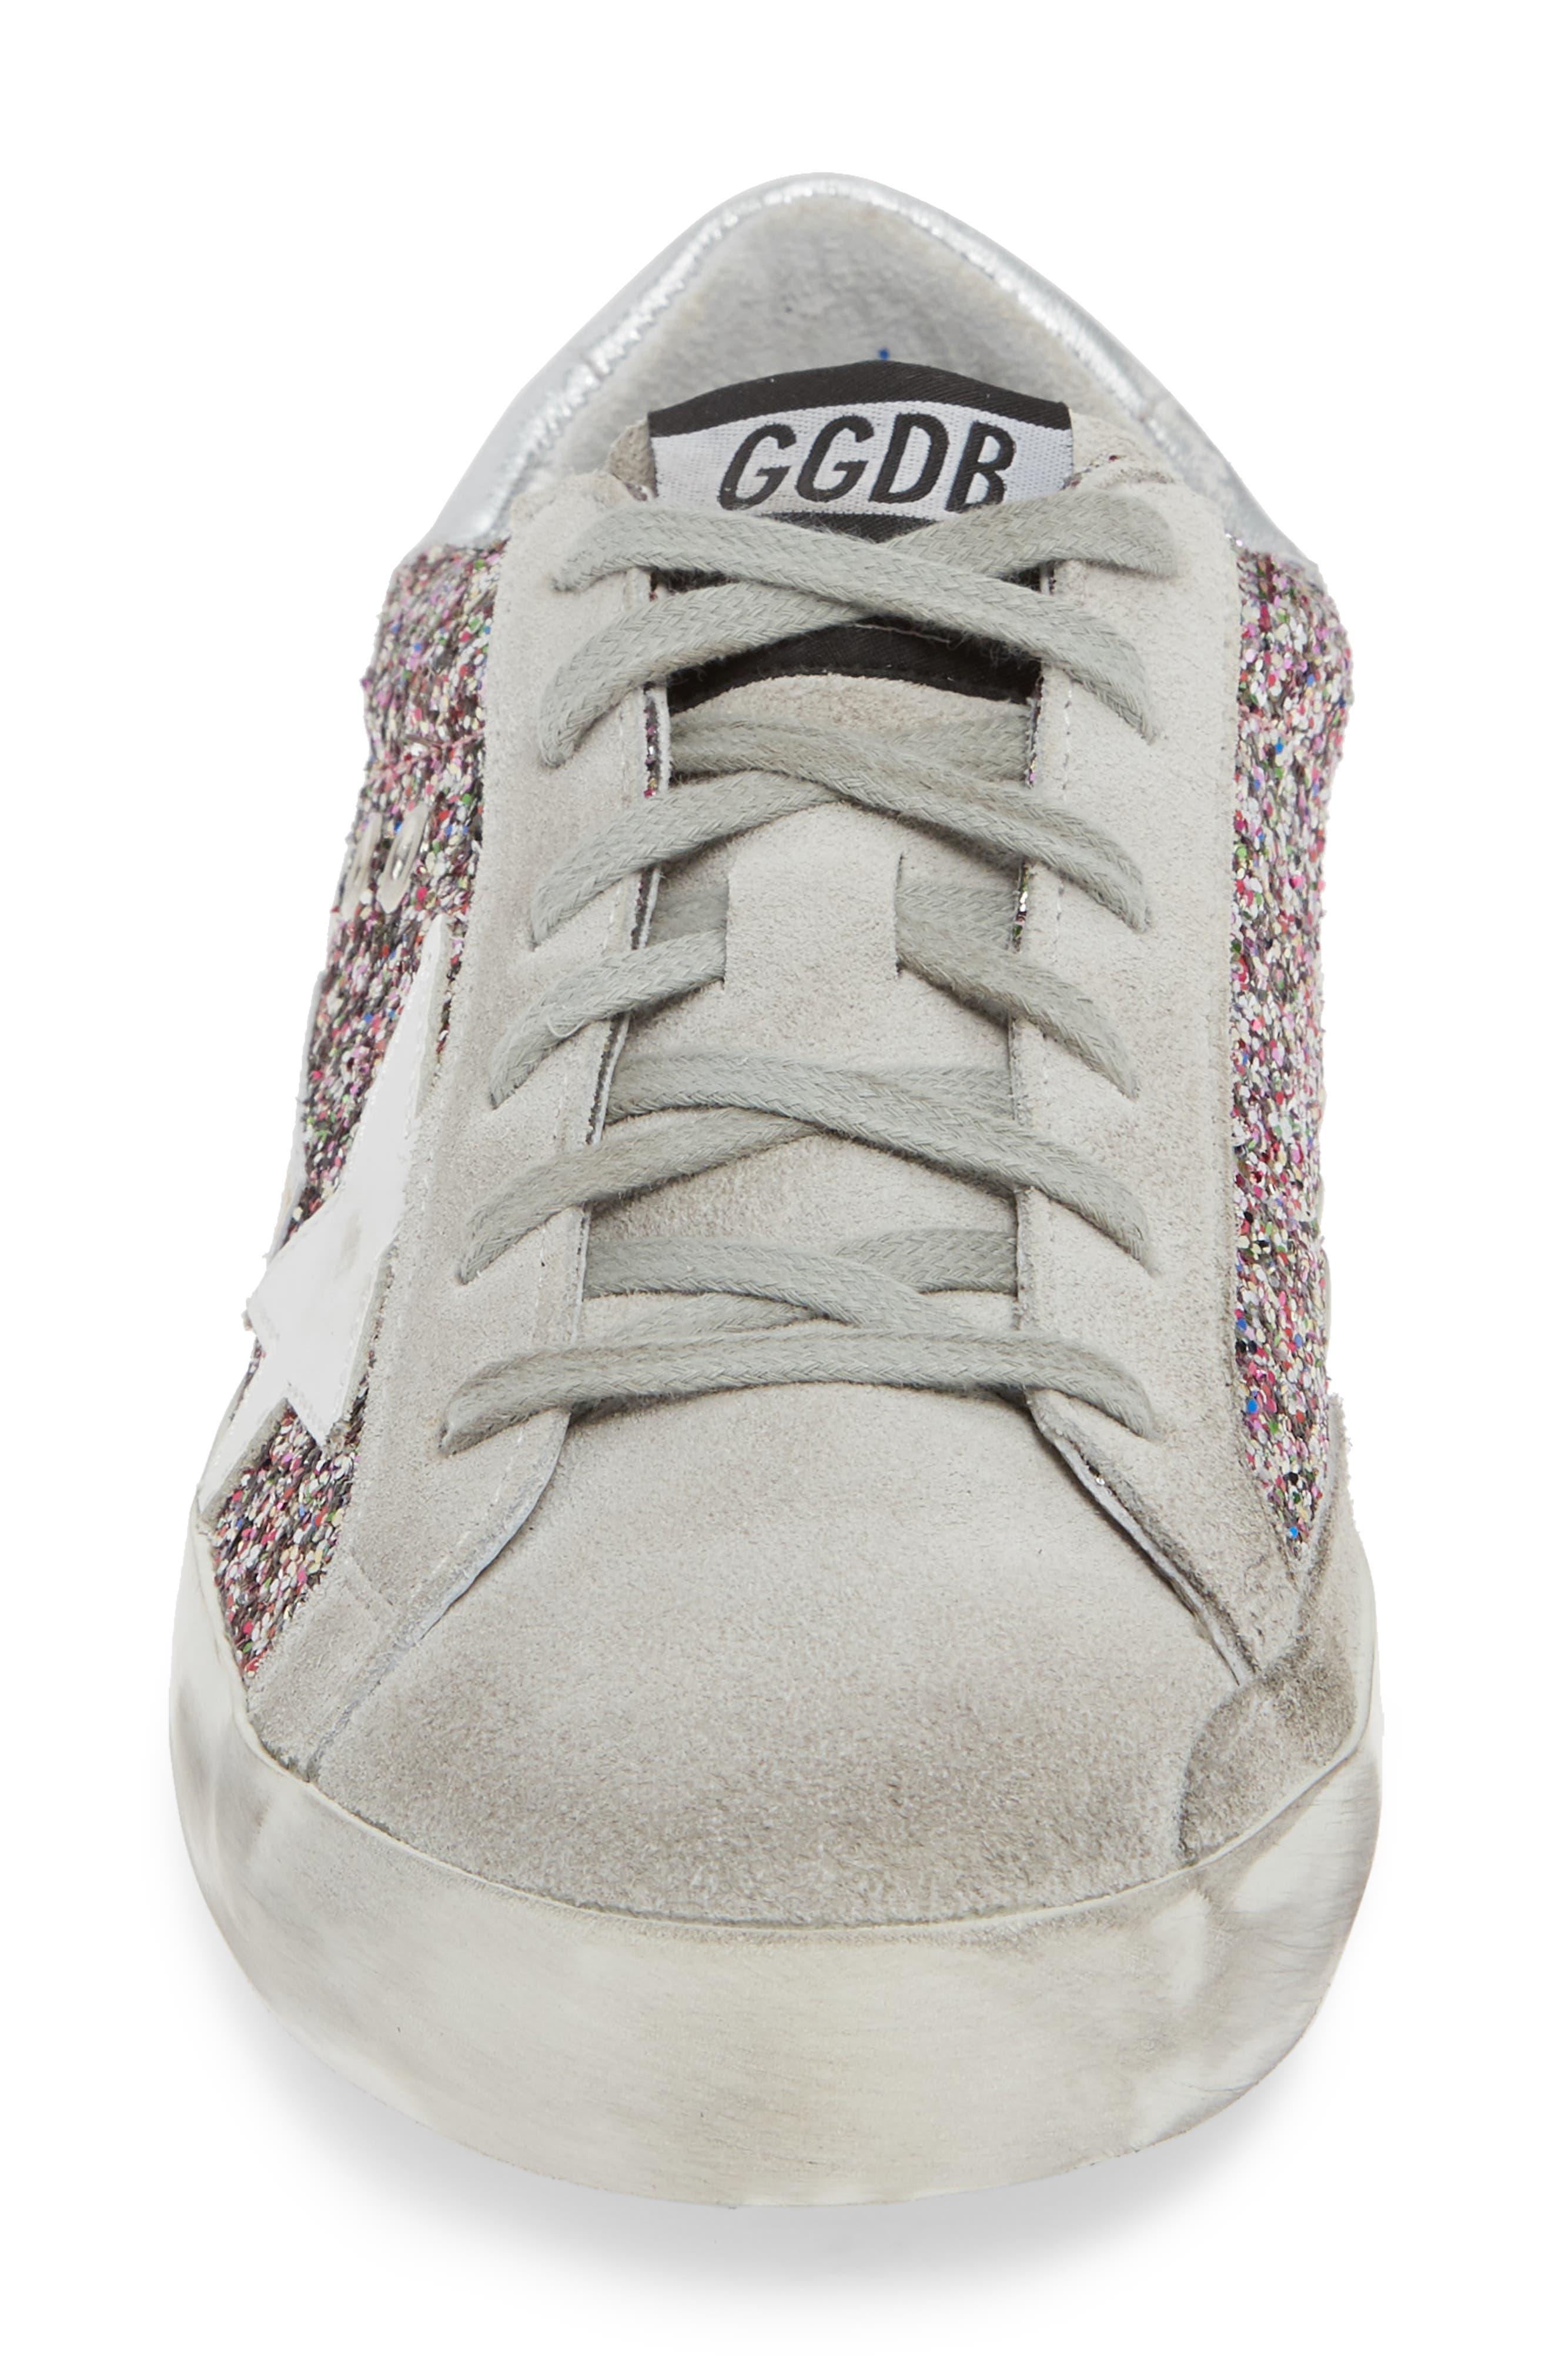 Superstar Glitter Sneaker,                             Alternate thumbnail 4, color,                             PINK MULTI/ GREY